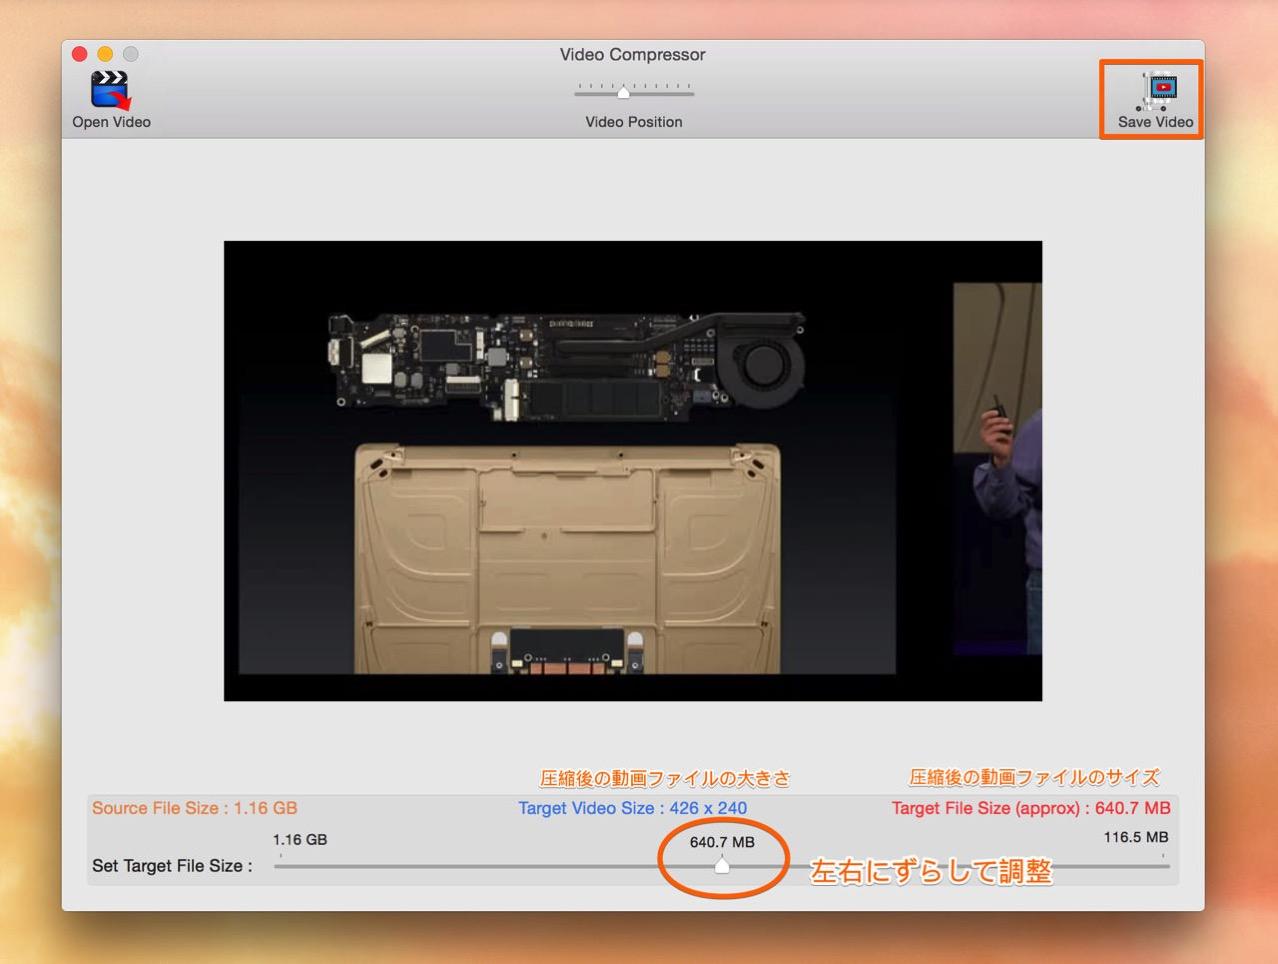 「Video Compressor」で圧縮後の動画の大きさとサイズを決定して圧縮を開始する